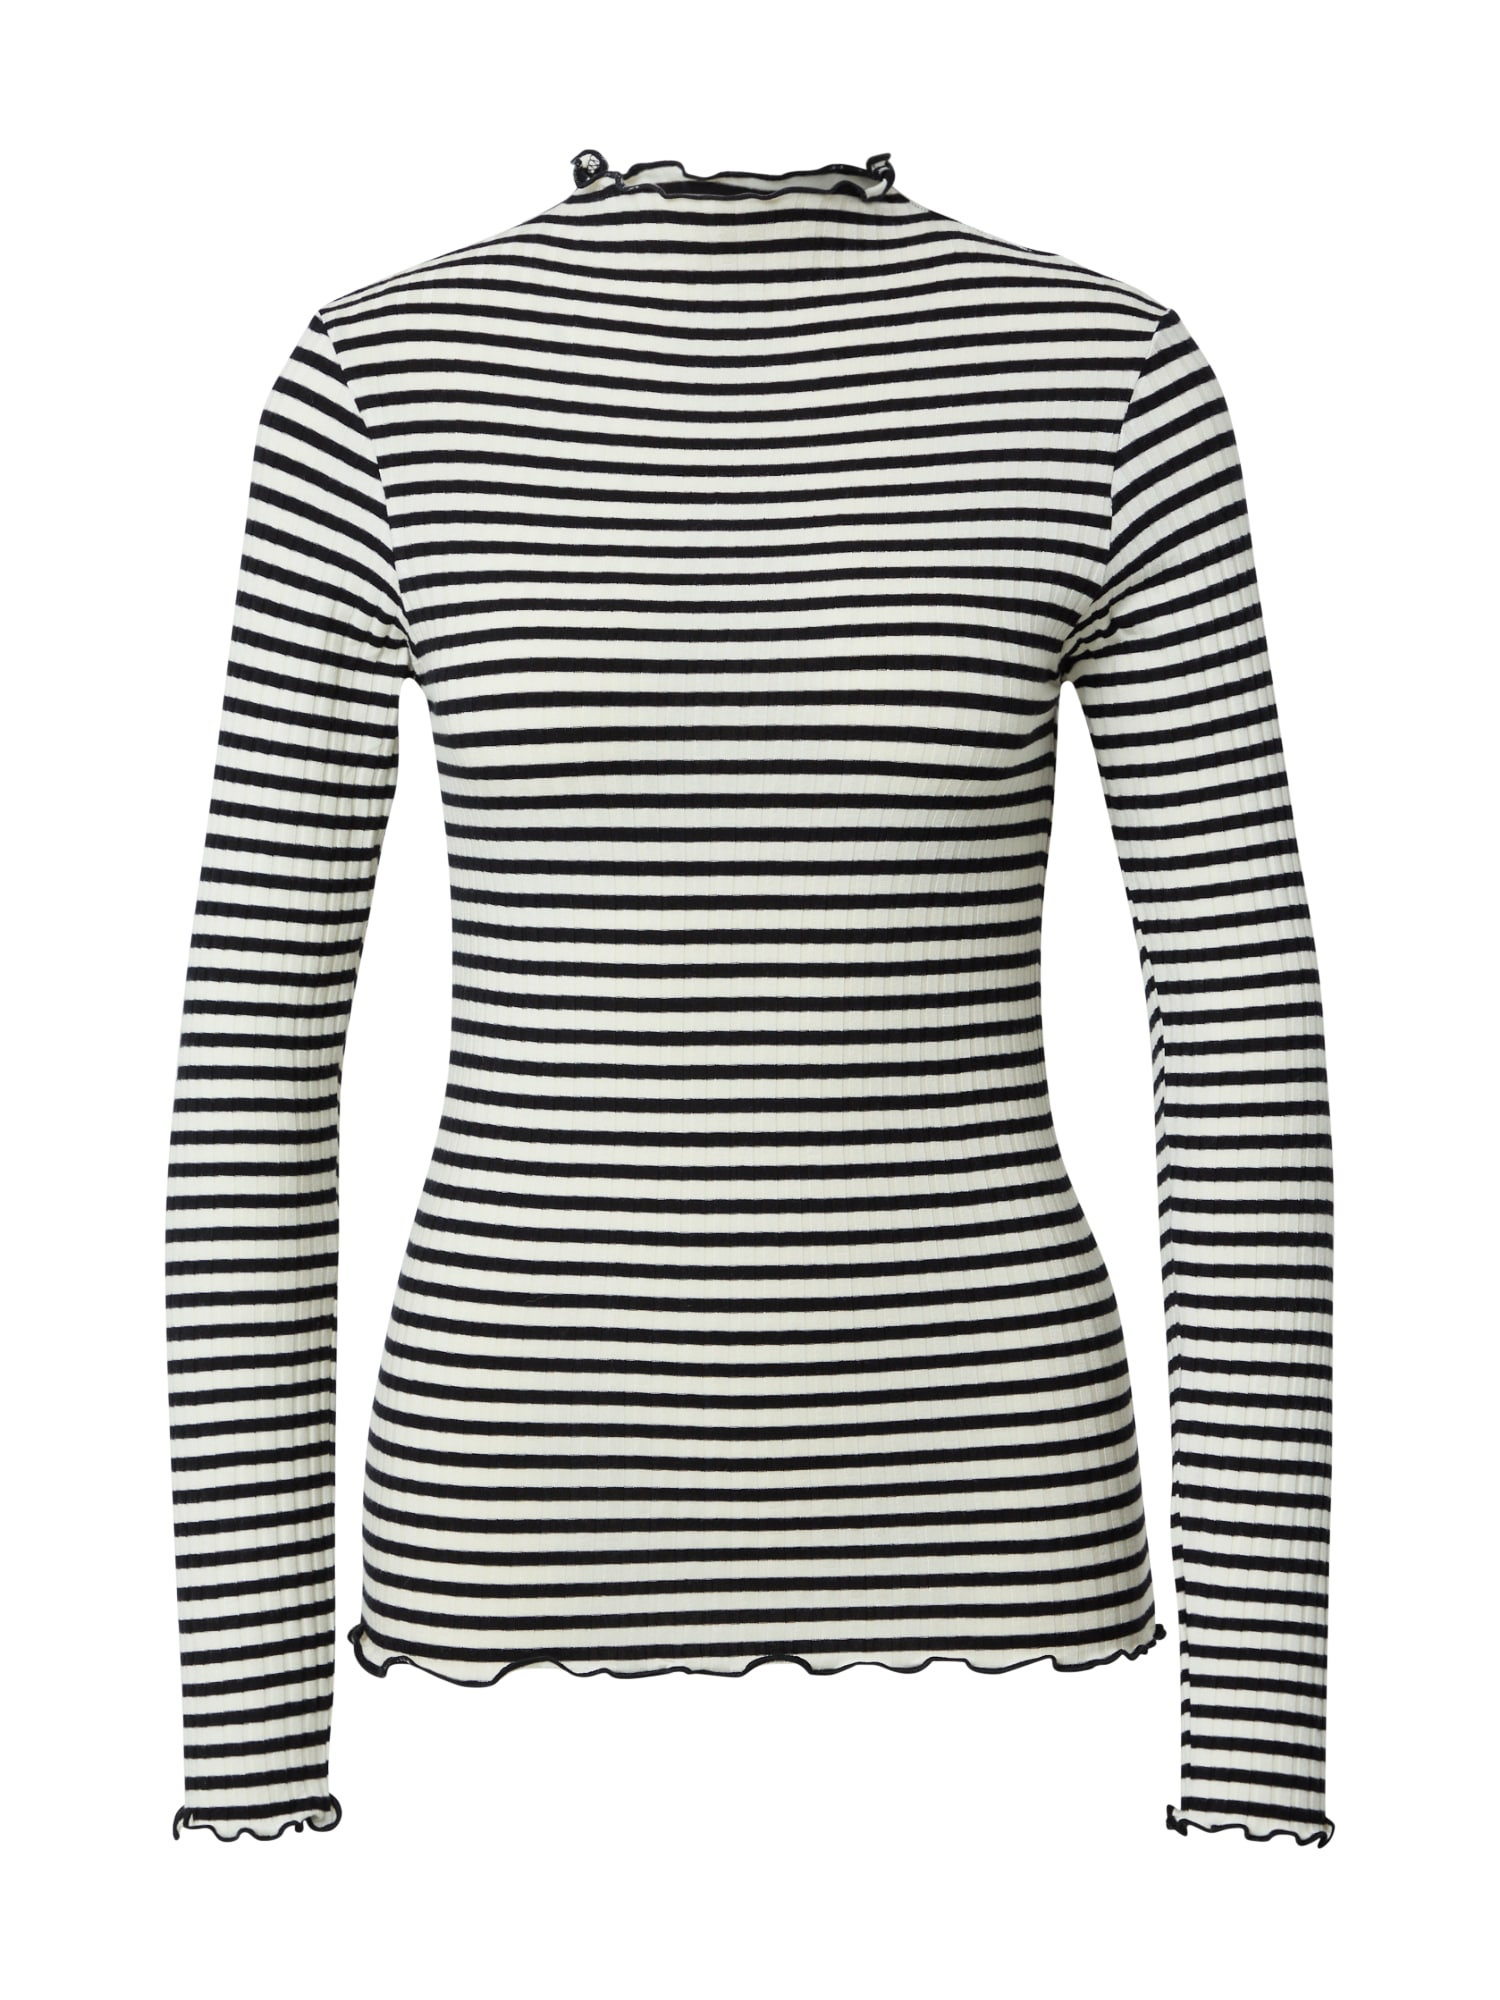 MADS NORGAARD COPENHAGEN Marškinėliai balkšva / juoda